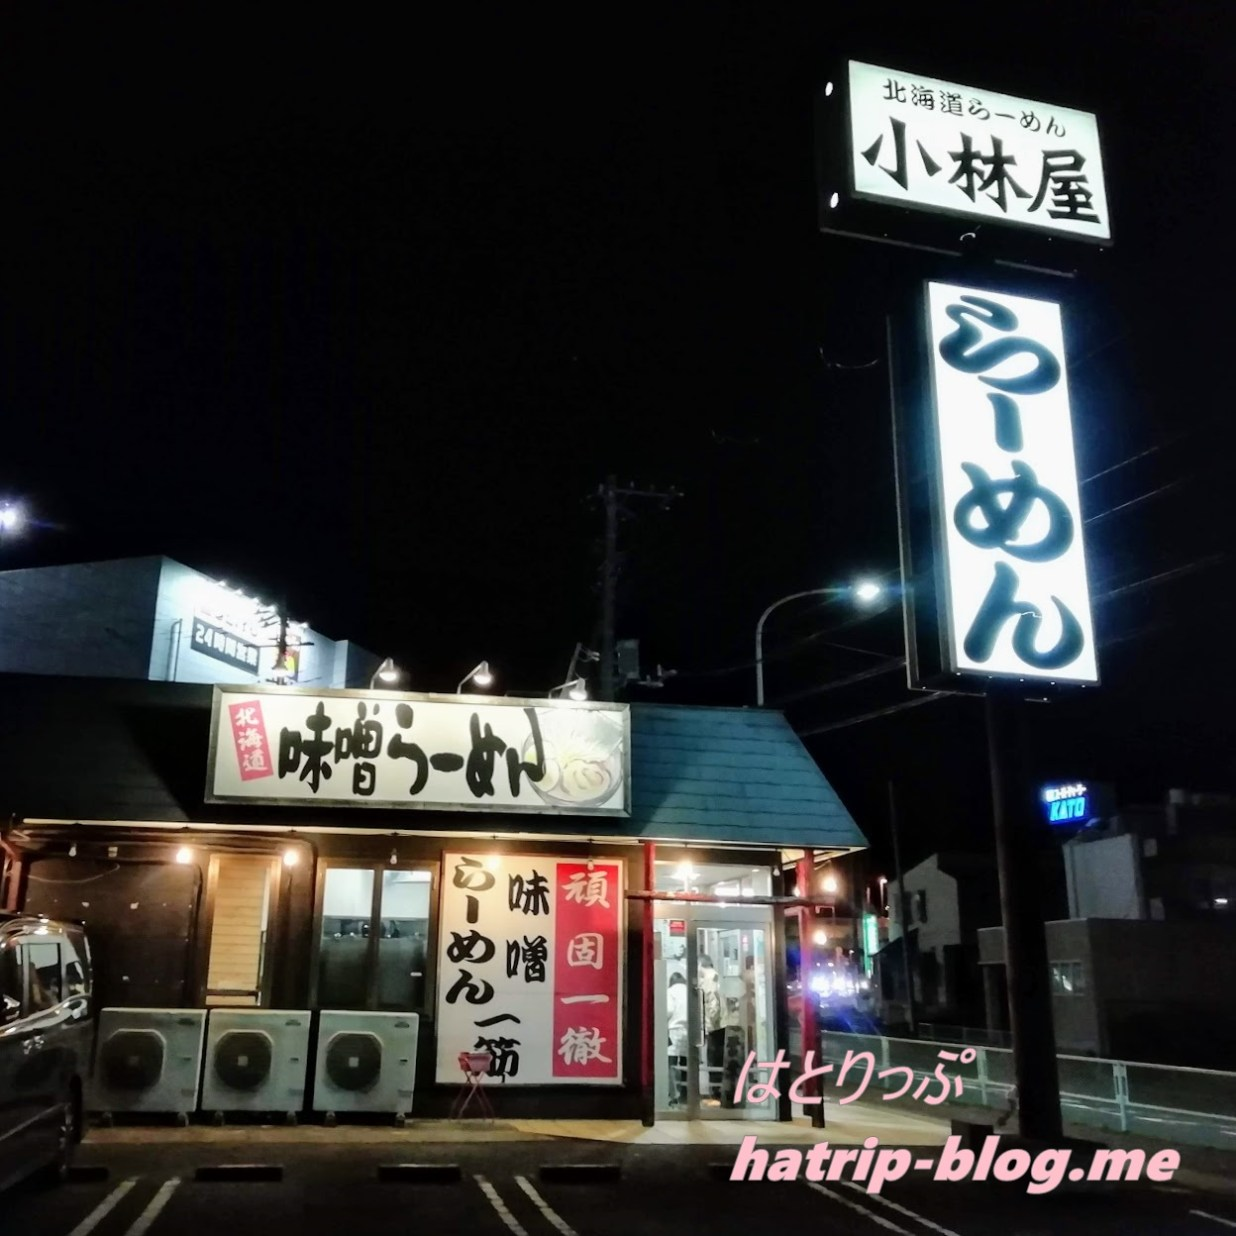 神奈川県平塚市 北海道らーめん 小林屋 平塚四之宮店